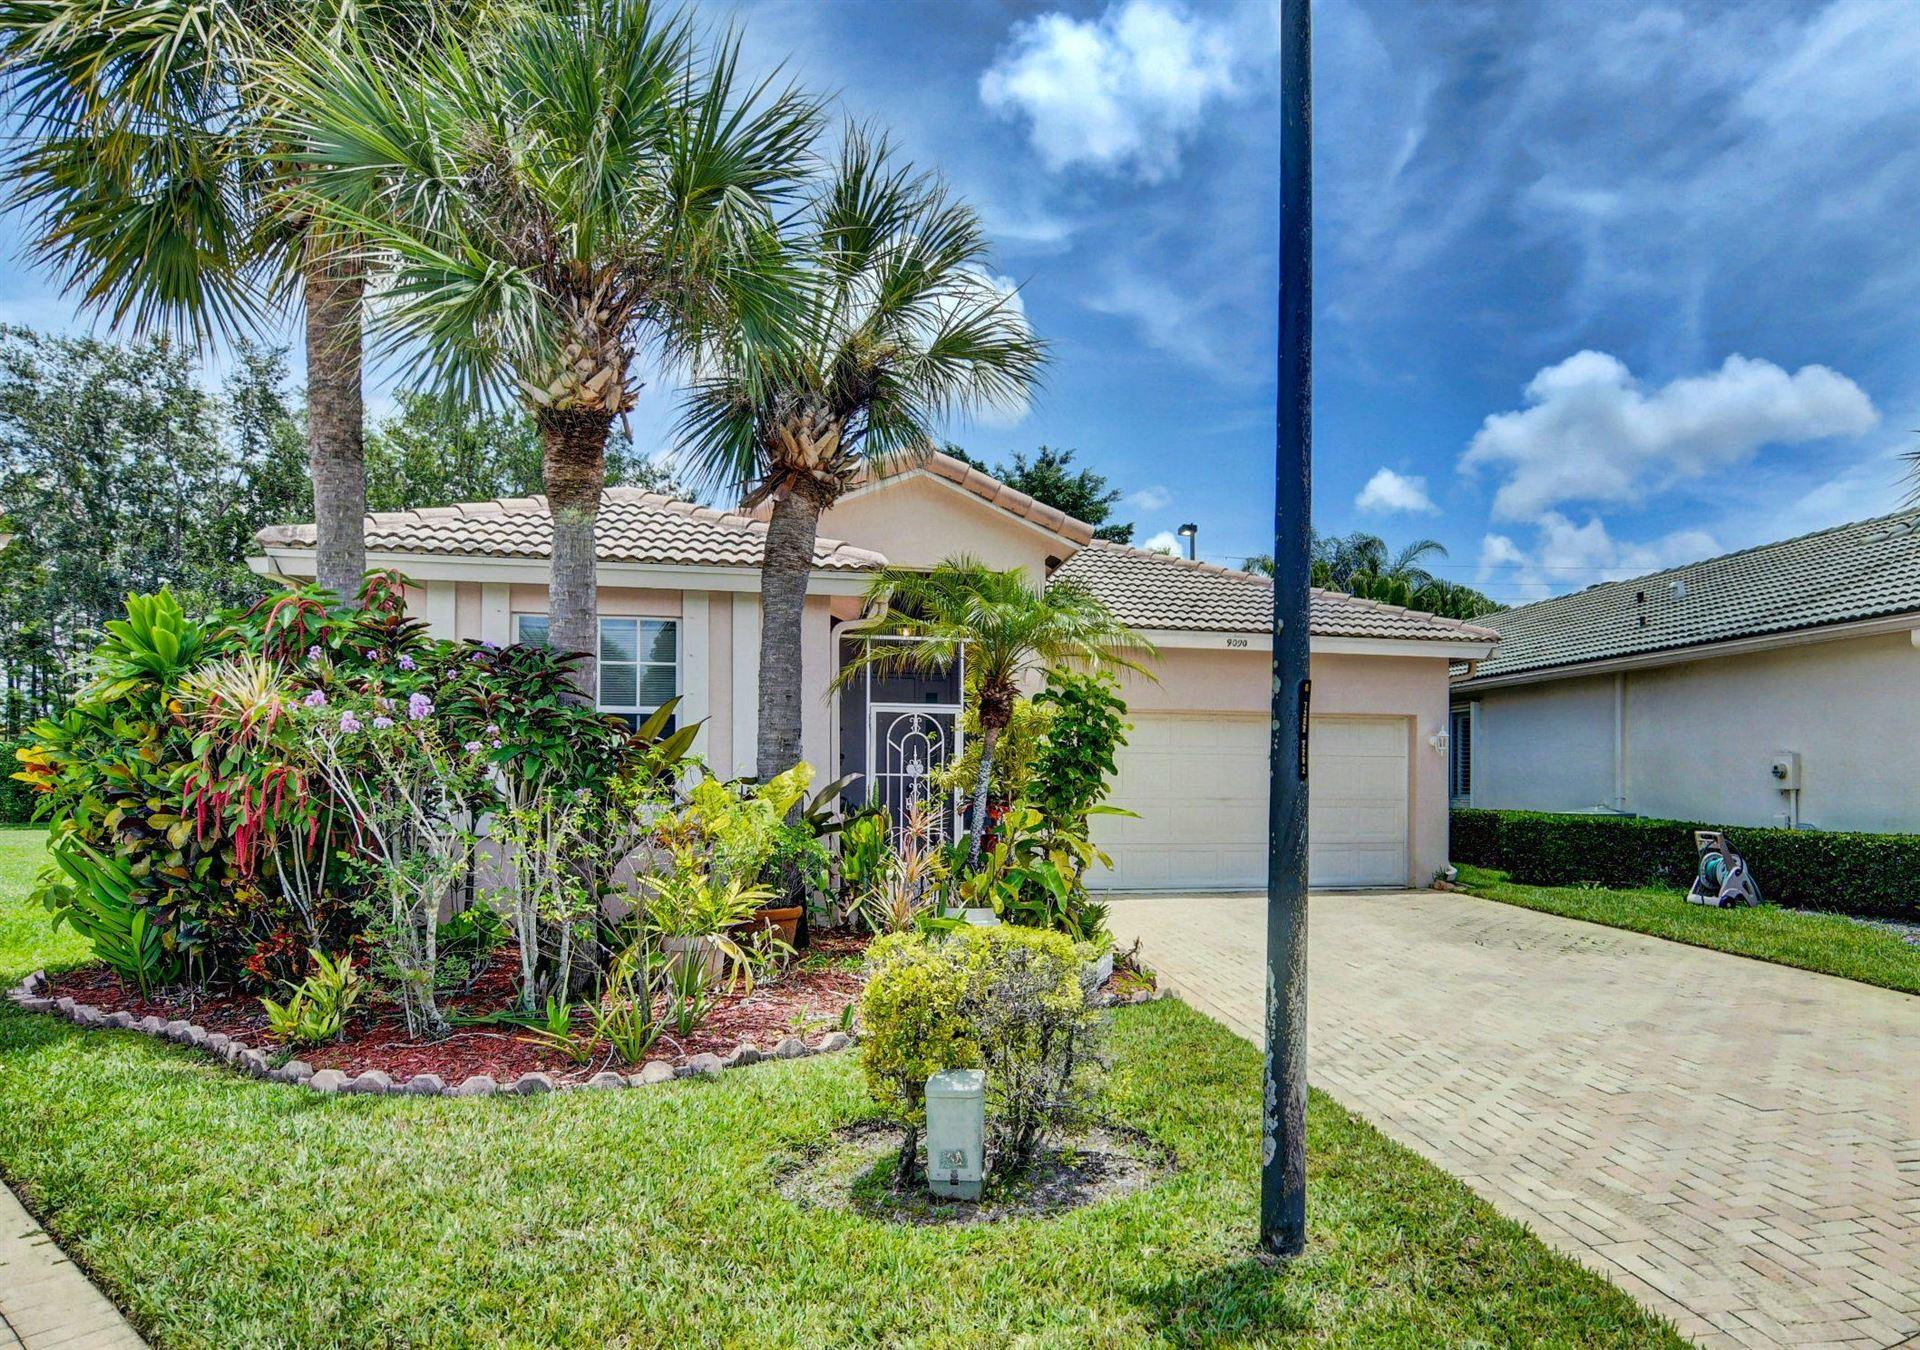 9090 Bay Point Circle, West Palm Beach, FL 33411 - MLS#: RX-10721850